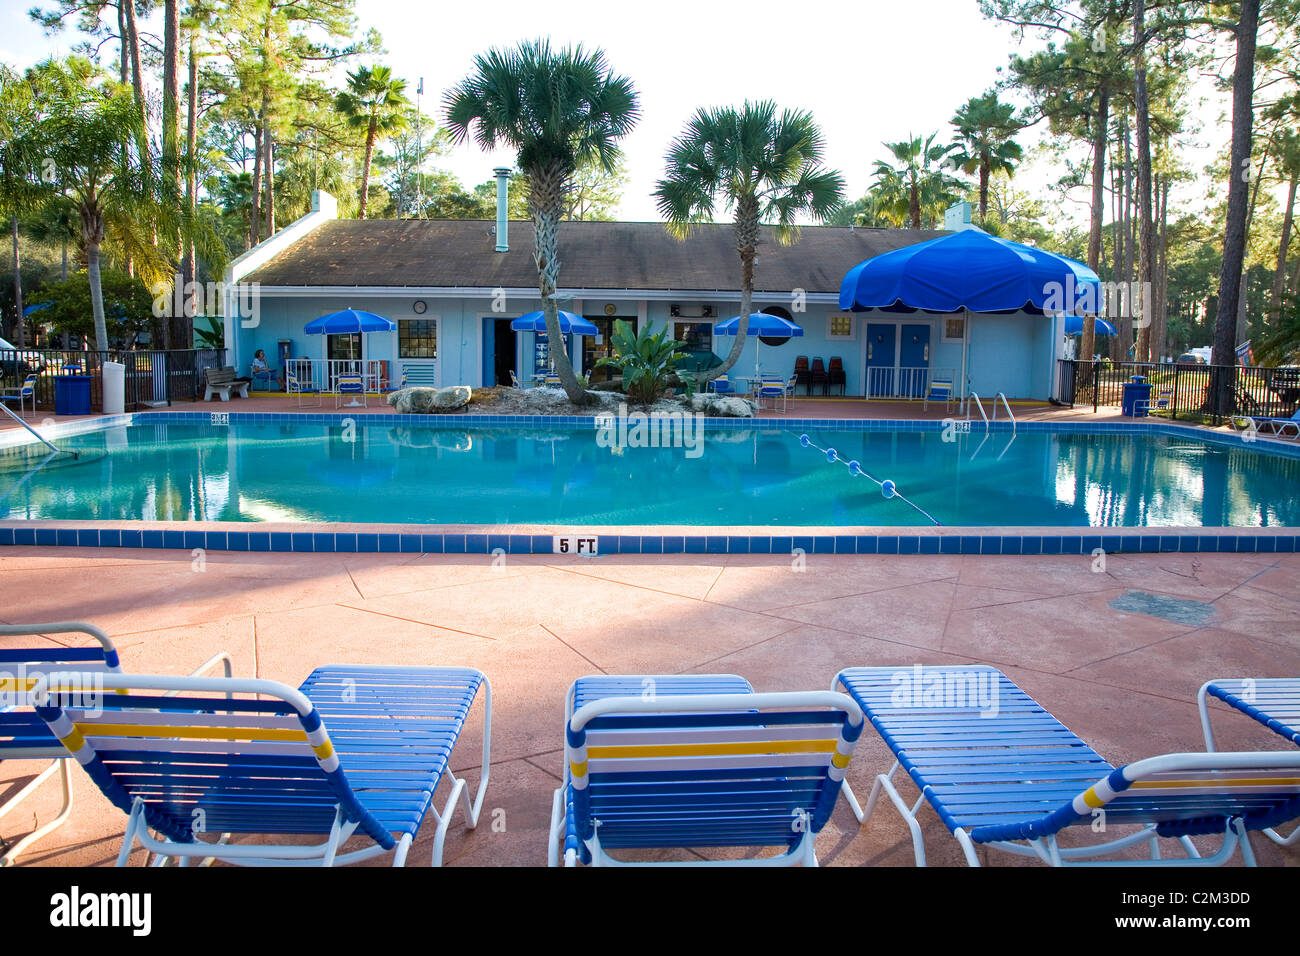 Pool area at Encore's Sunshine Holiday Daytona RV Resort, Ormond Beach, FL - Stock Image